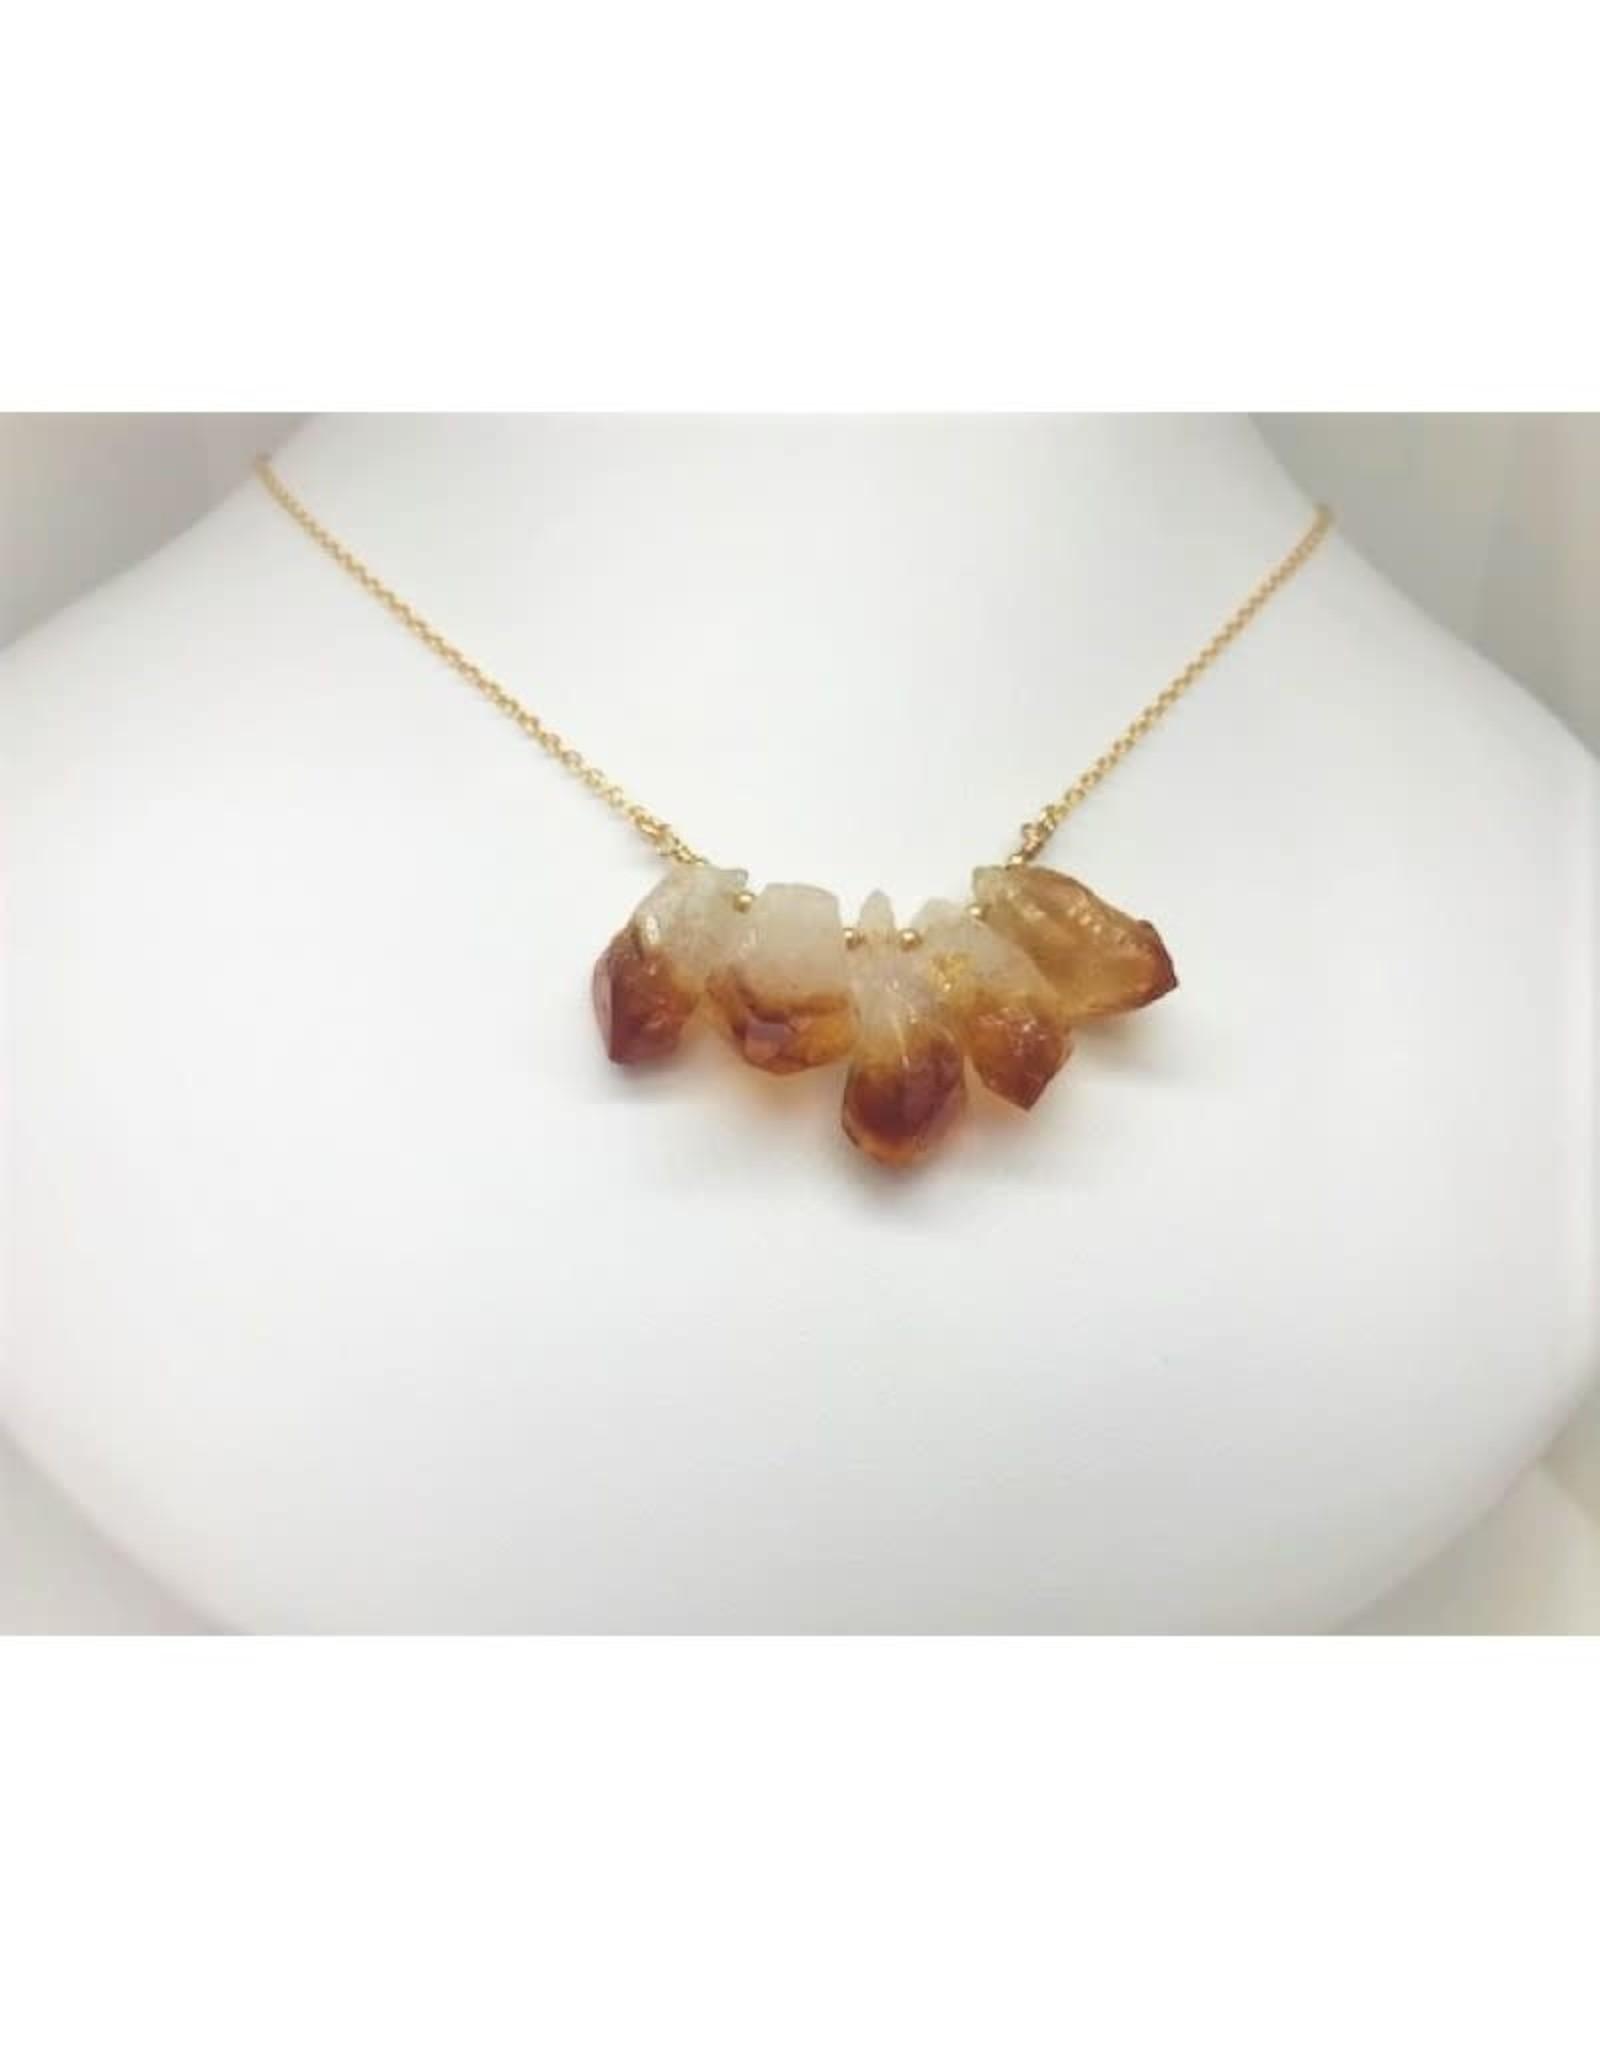 Raw Gemstone Necklace - Citrine Seven Stone